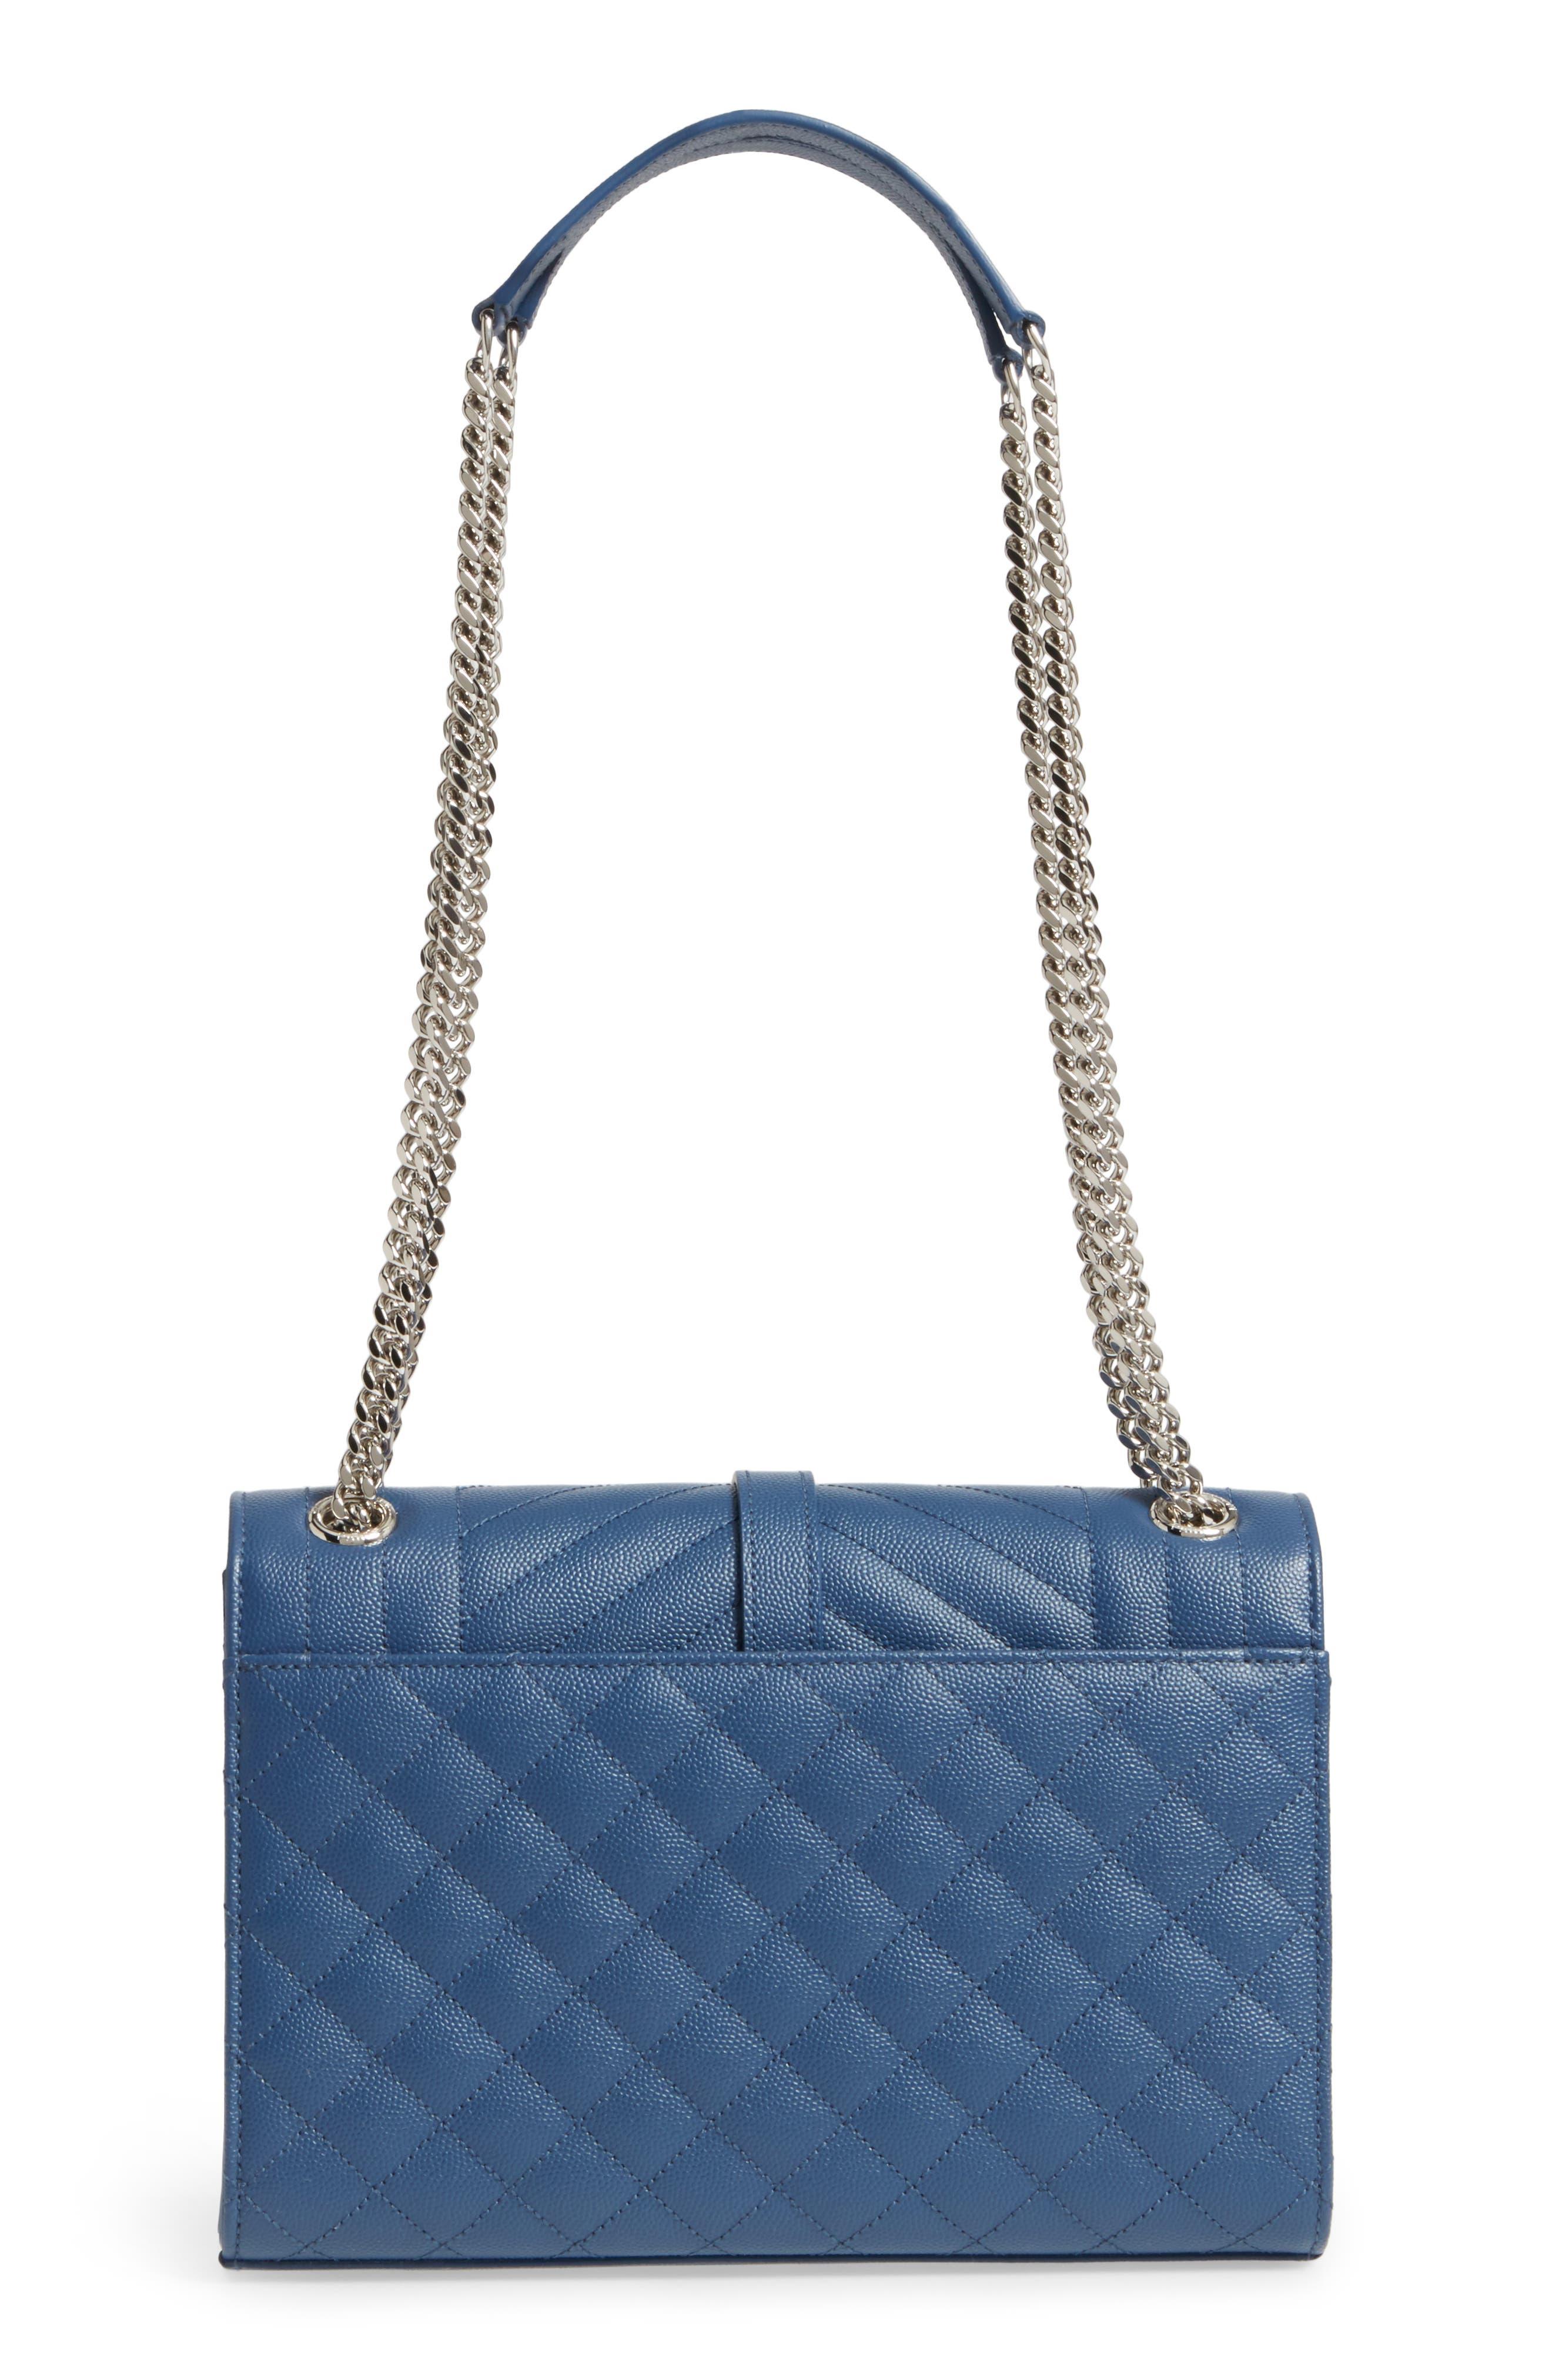 Medium Cassandra Calfskin Shoulder Bag,                             Alternate thumbnail 3, color,                             DEEP MARINE